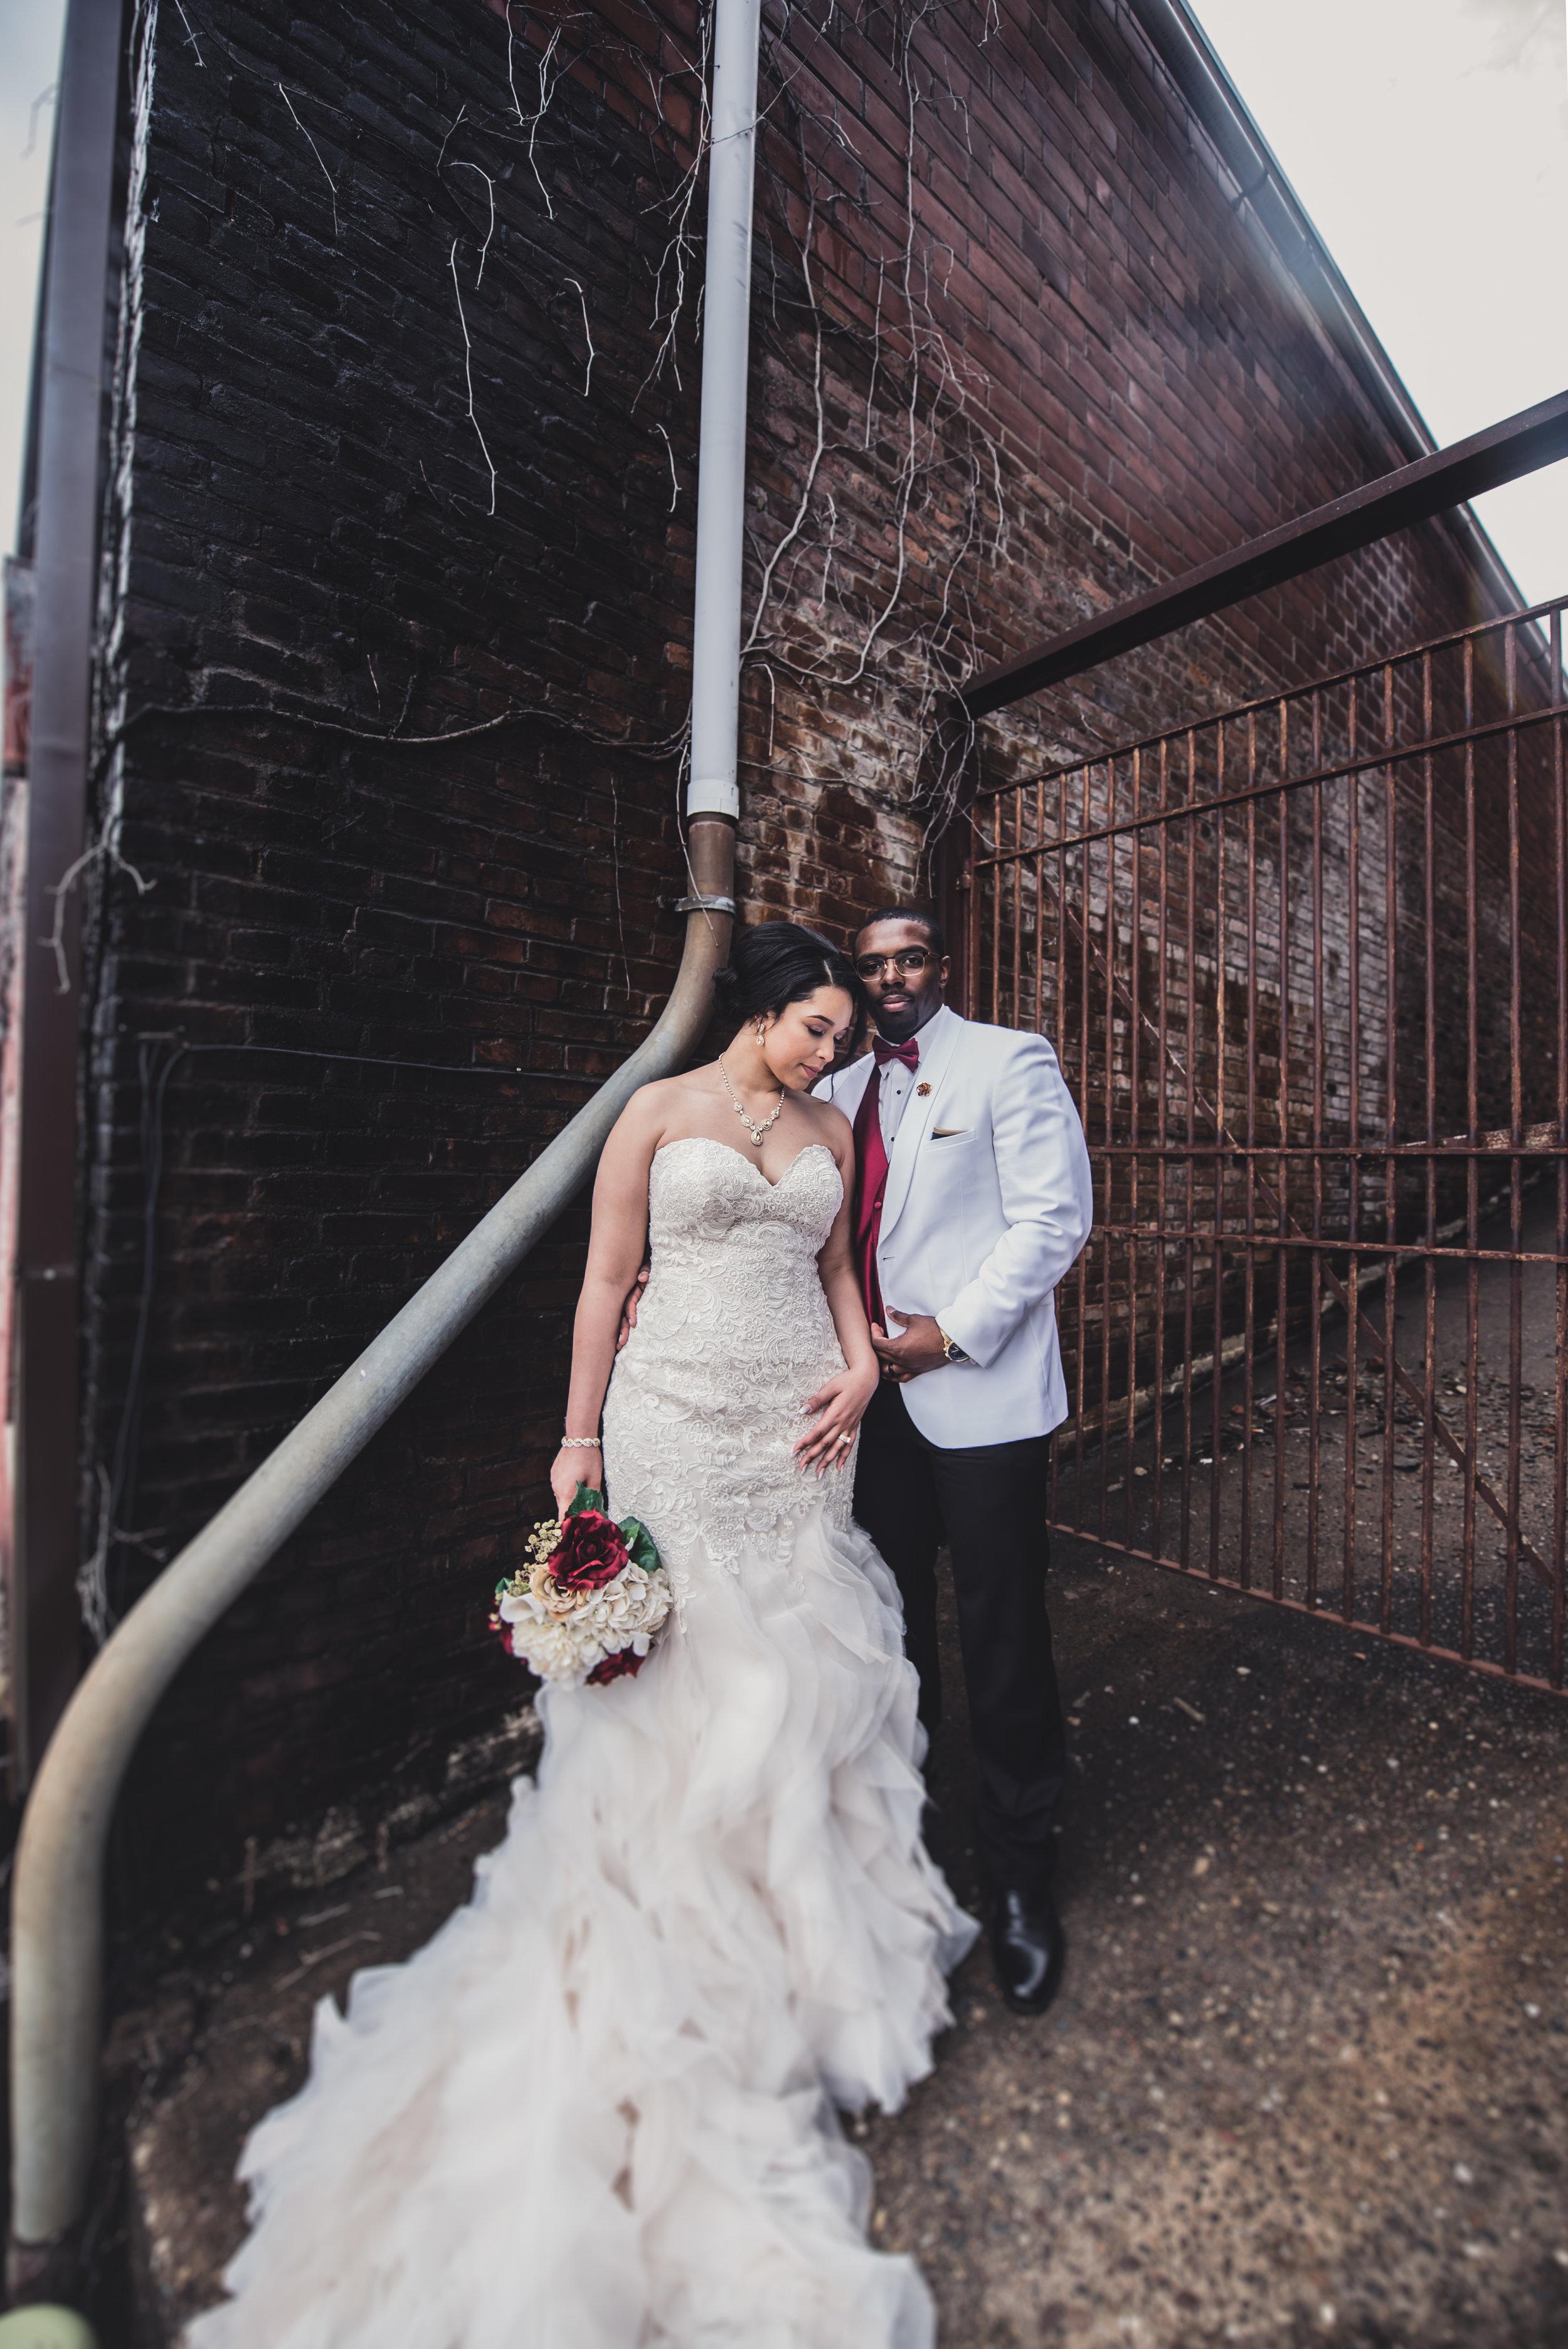 Burlington Iowa Wedding Midwest Photographer Melissa Cervantes _ Chantelle and Isaiah 610a.jpg